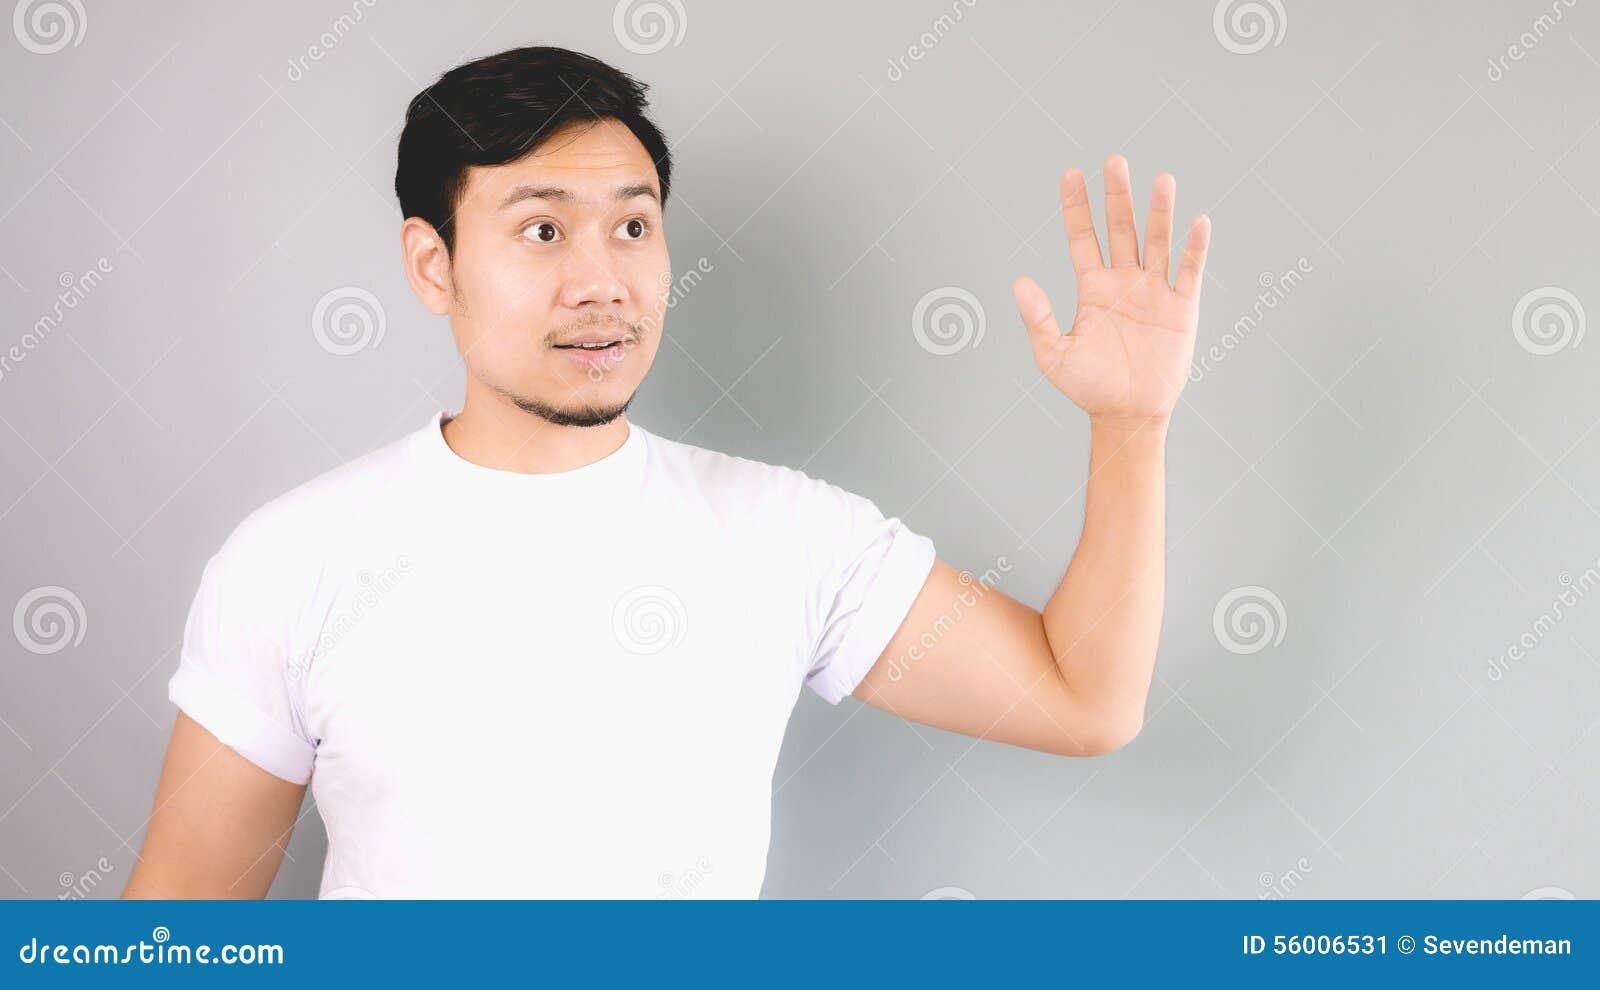 Person waving clipart - ClipartFest